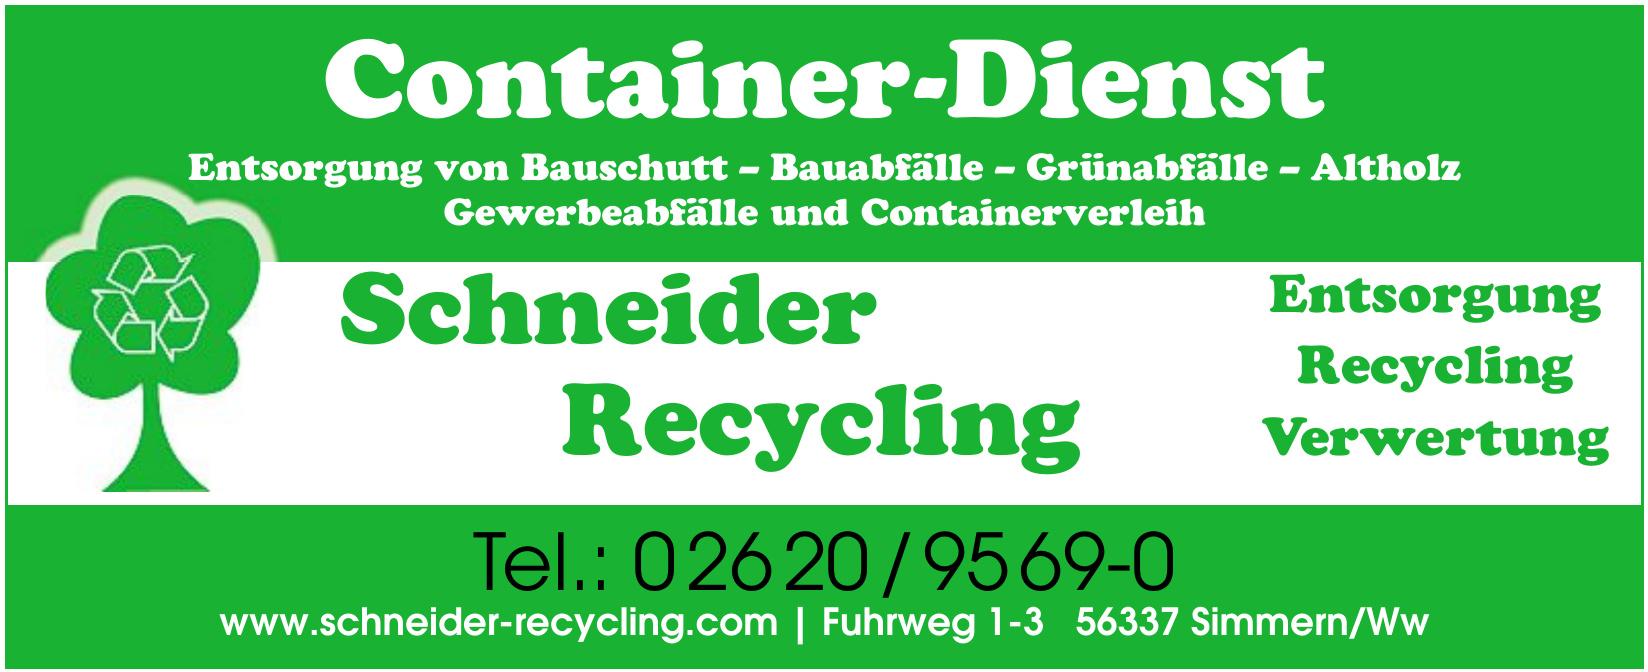 Schneider Recycling